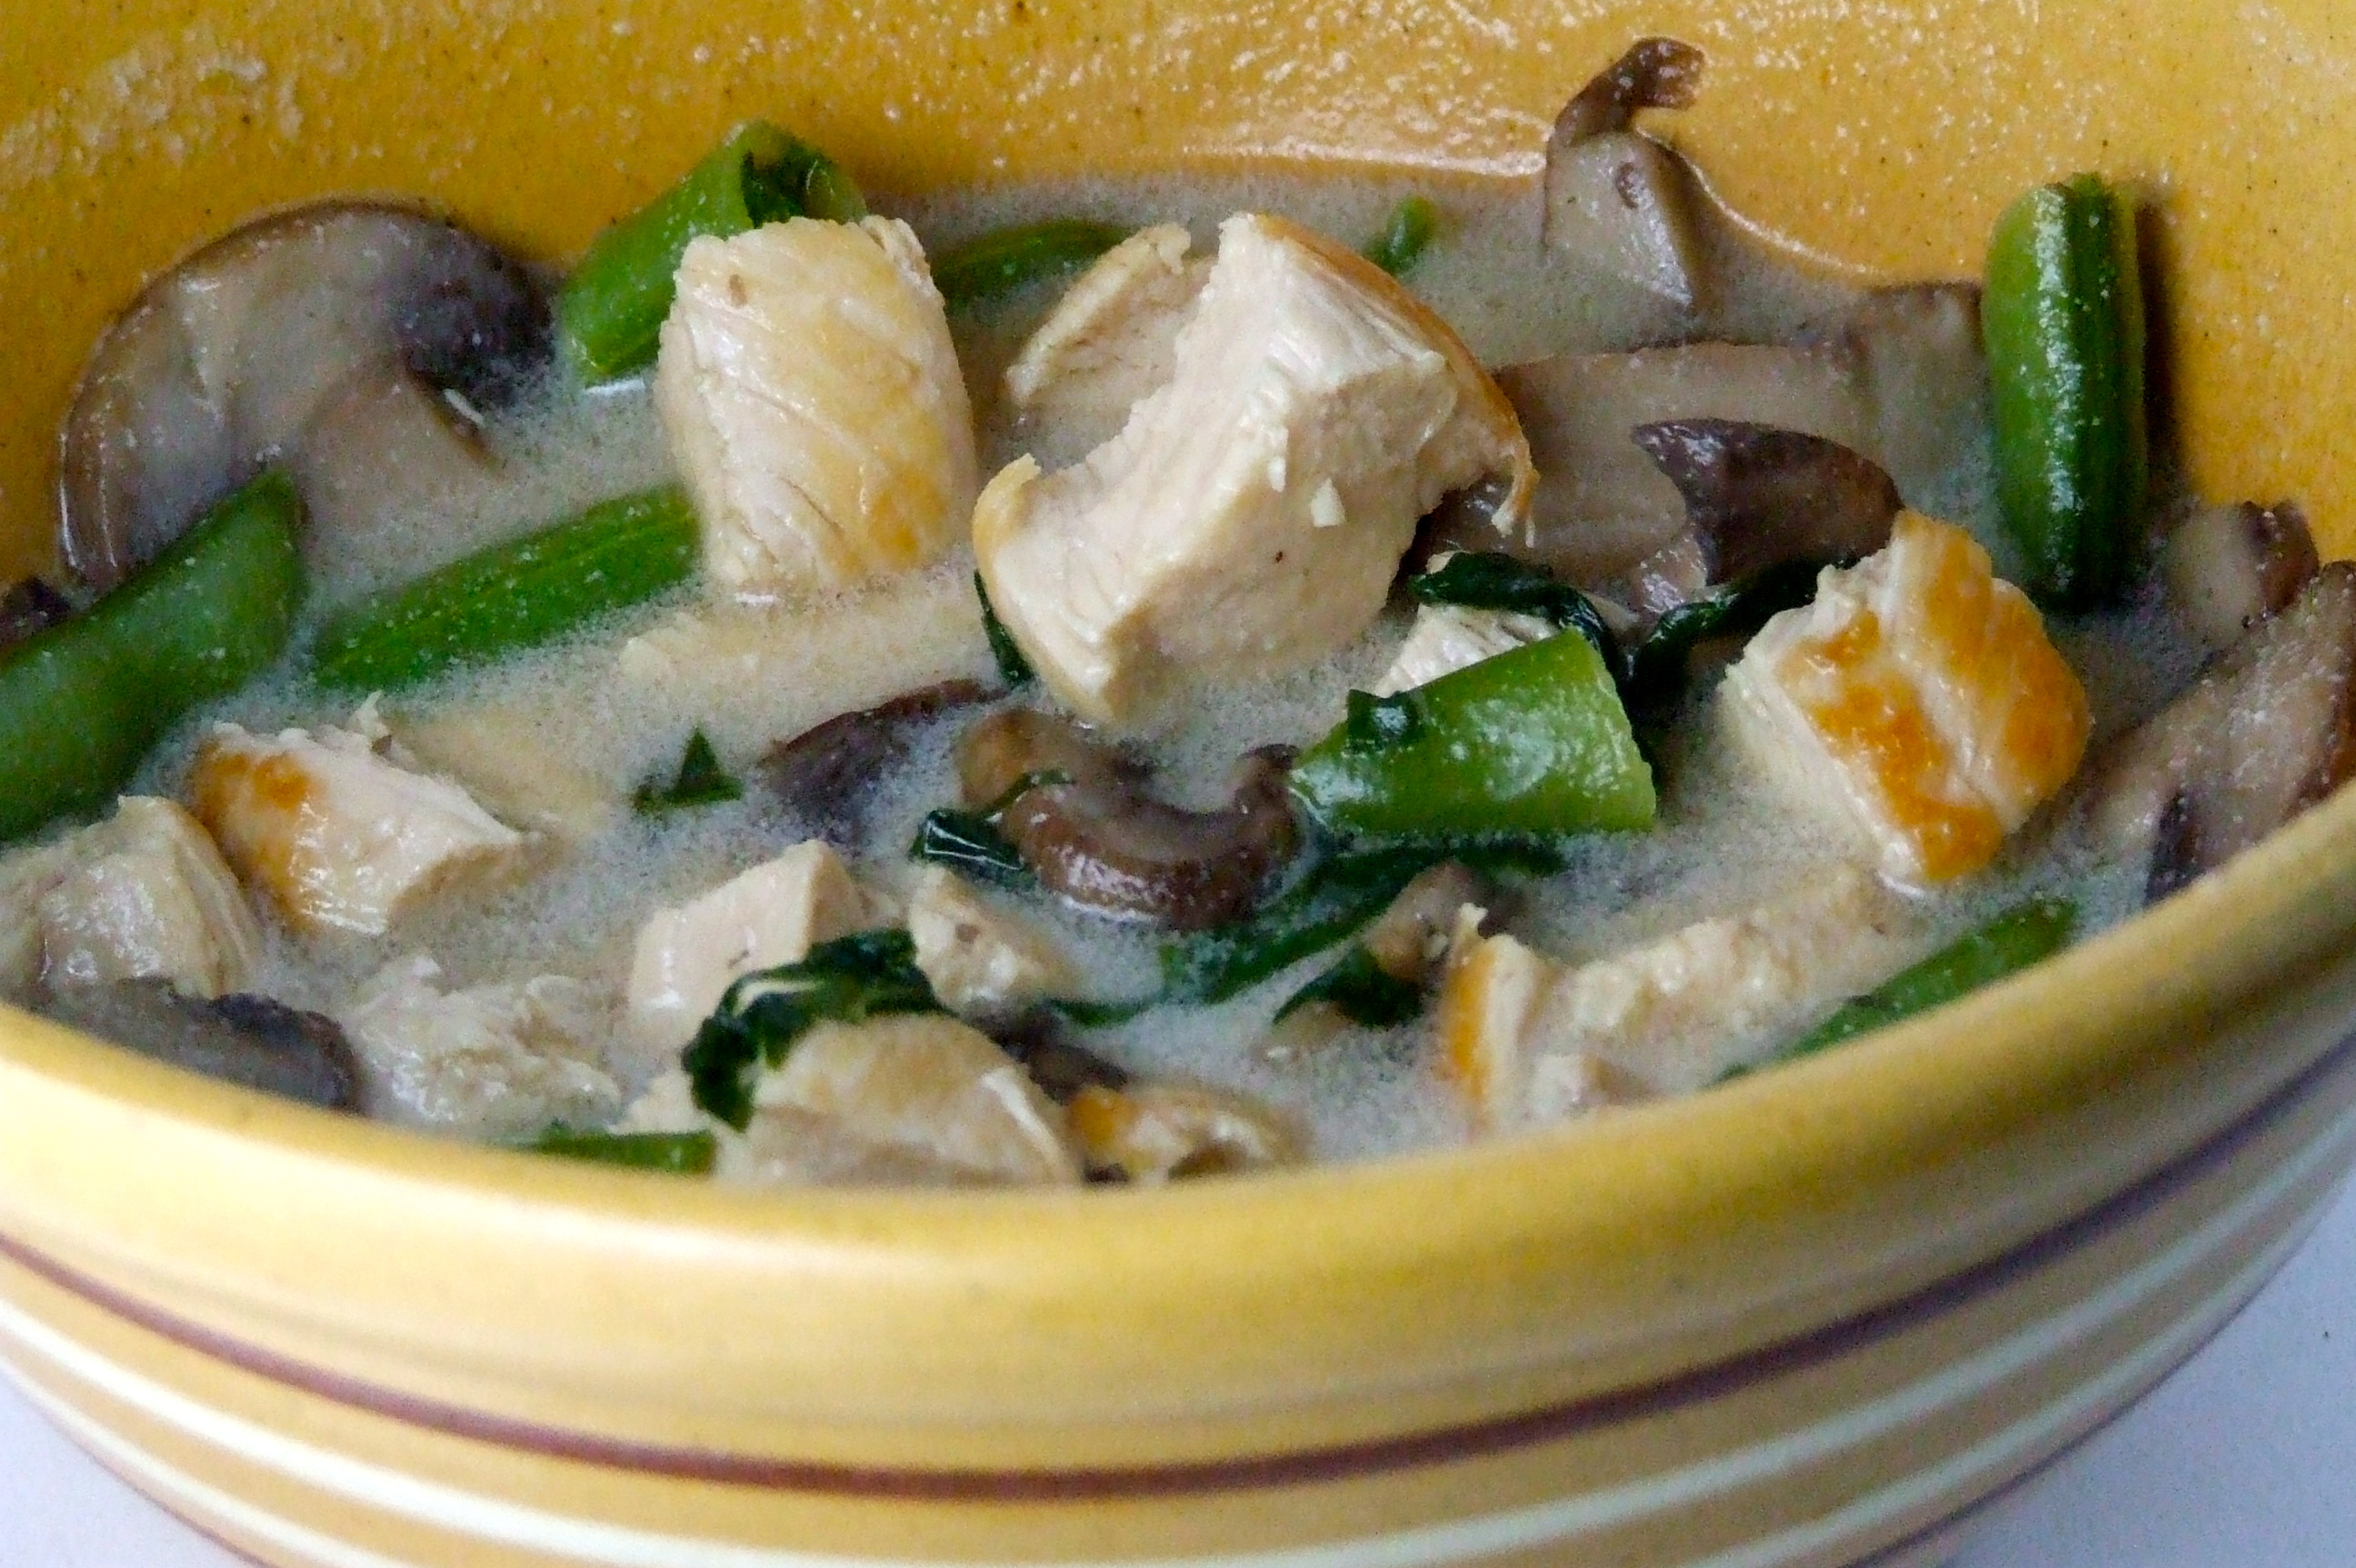 Soupy Sundays: Hot-and-Sour Coconut Soup